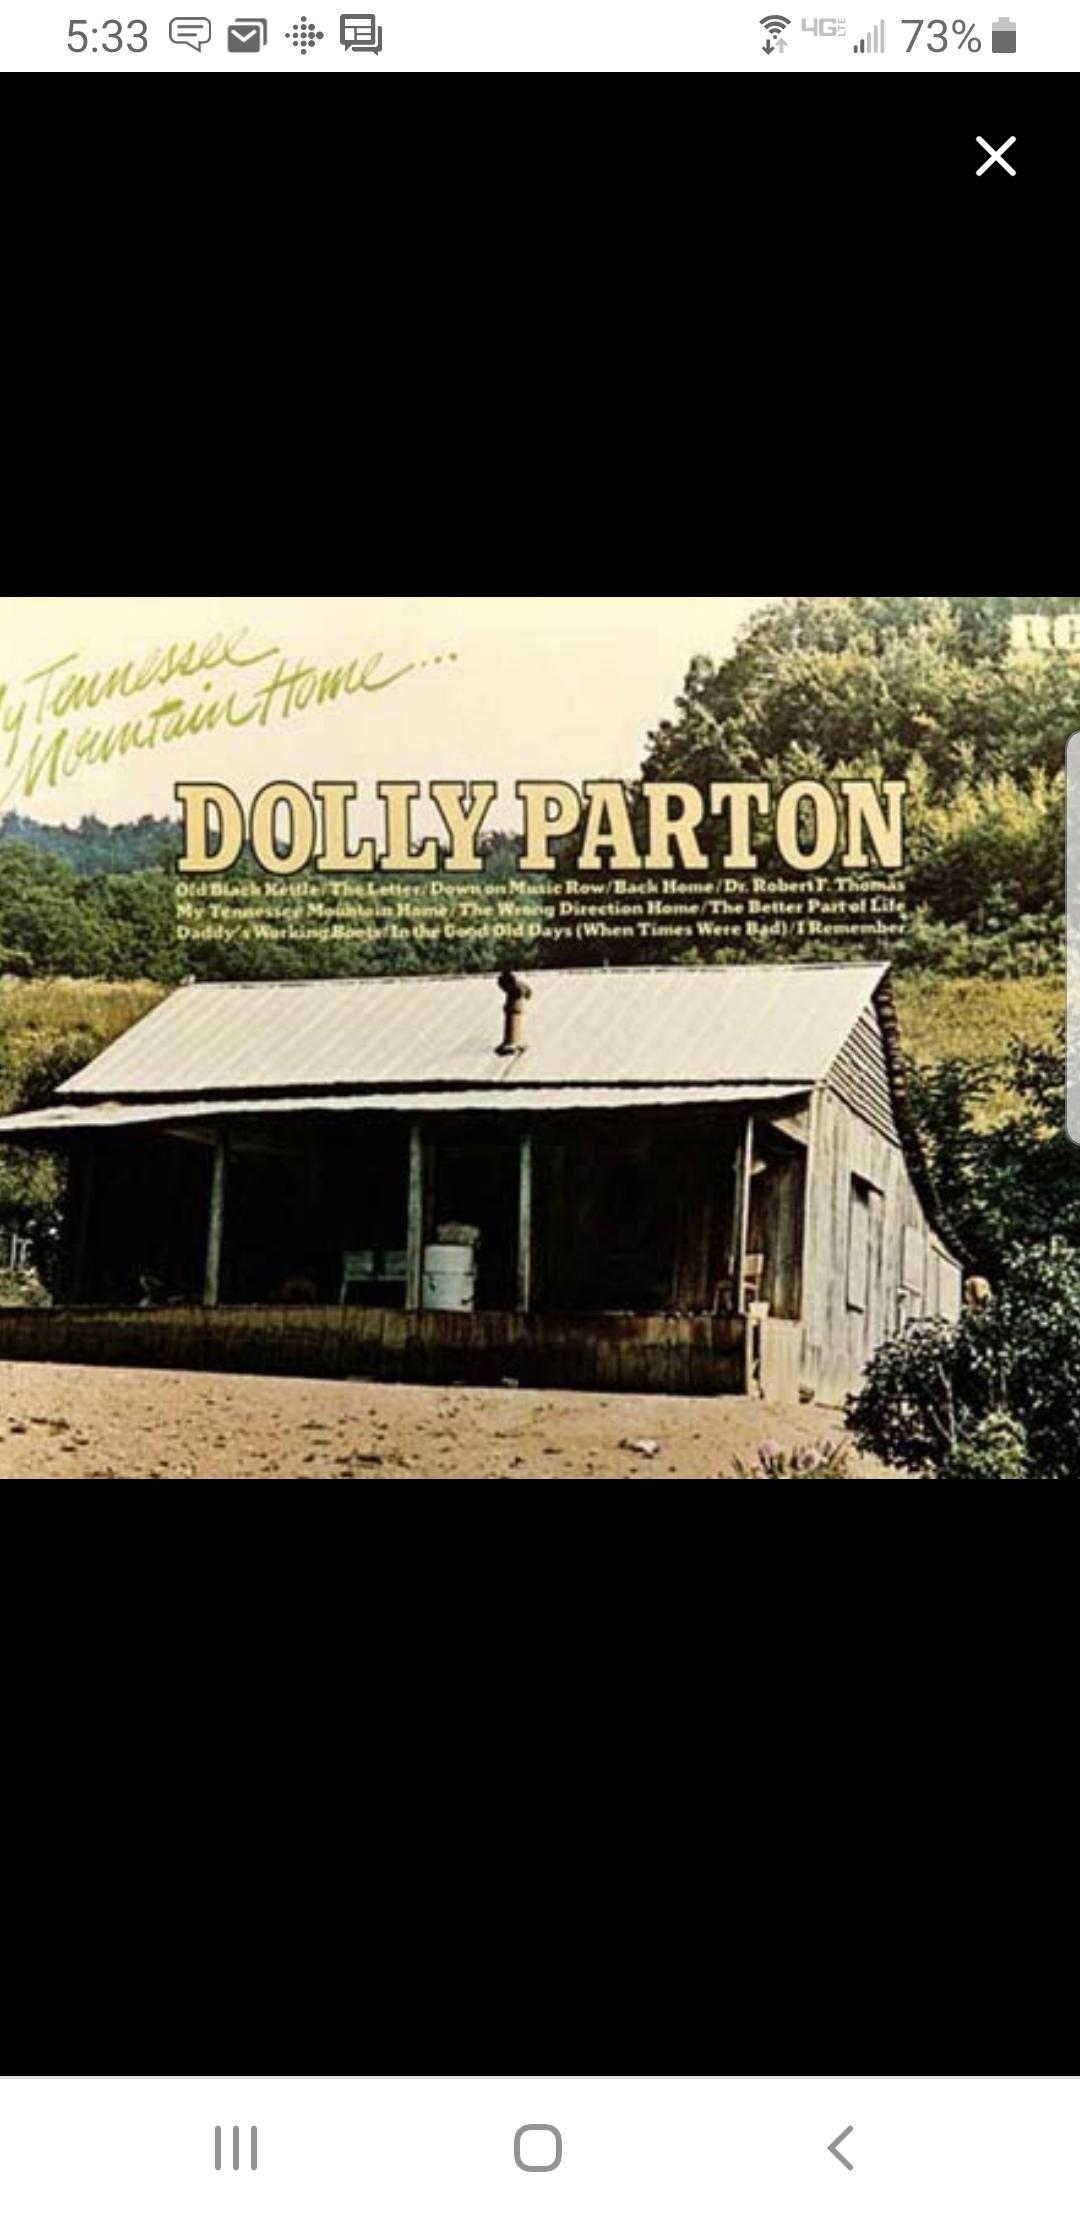 A Trip To The Cabin Dolly Parton Called Her Home Buckhorn Inn